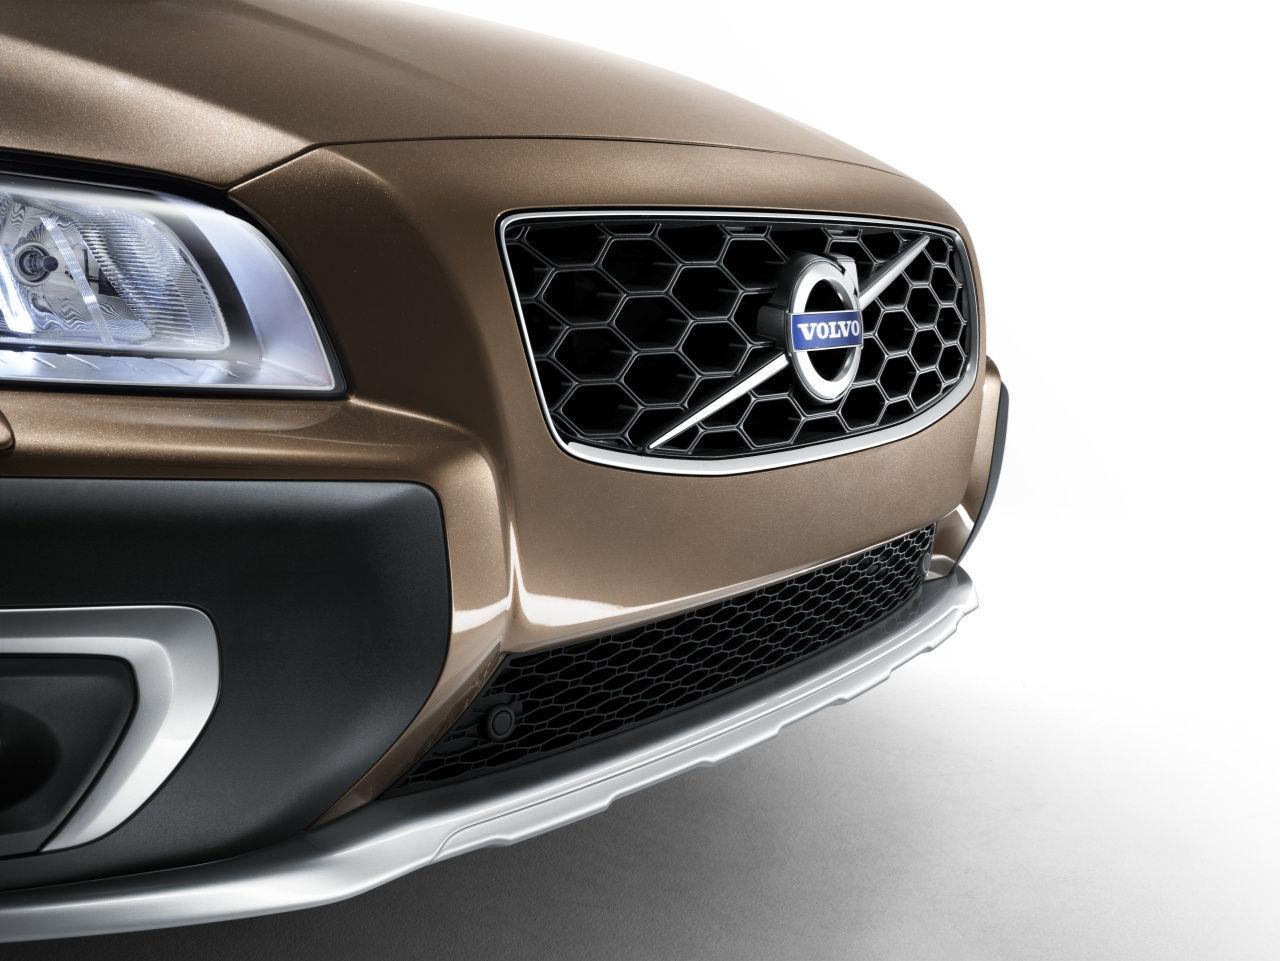 2014 Volvo XC70   2014 Volvo XC70